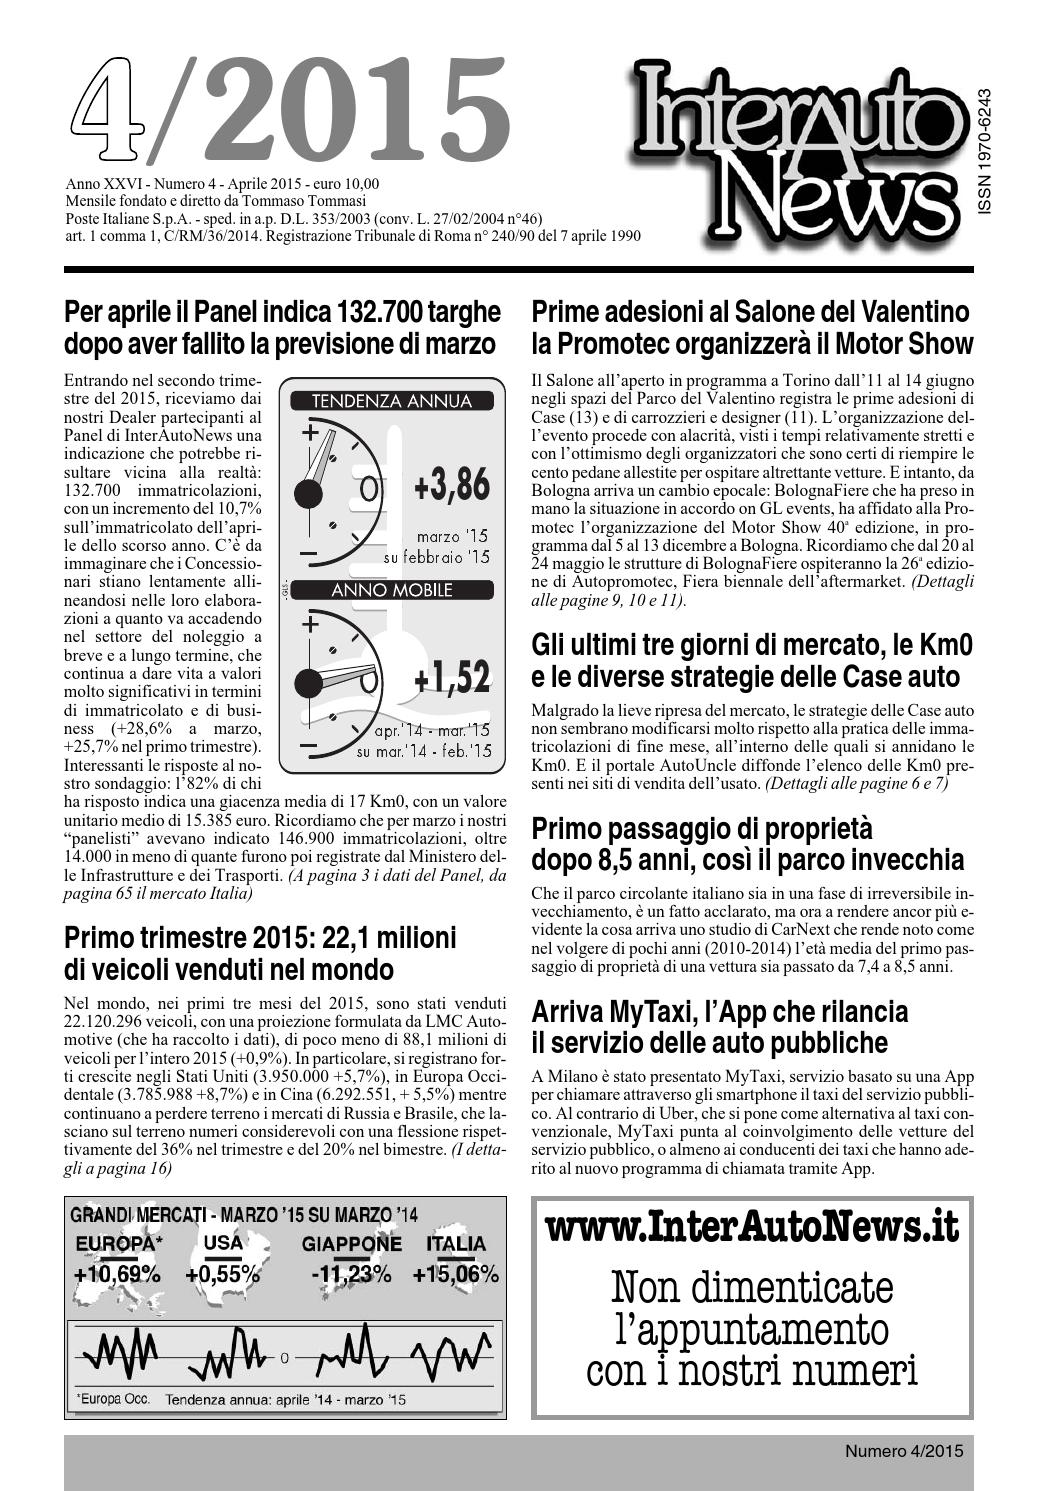 Ian 0415 by InterAutoNews - issuu 5a3db280191